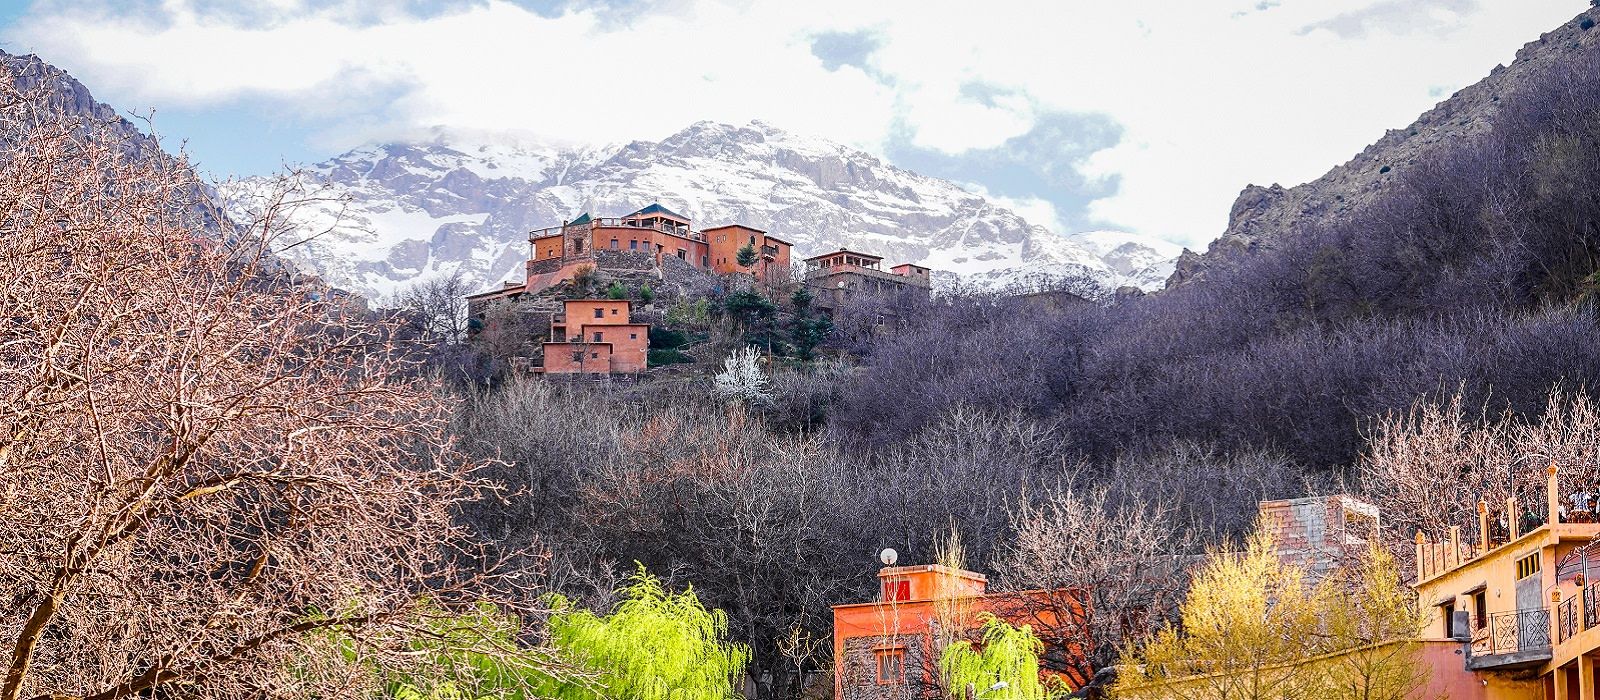 Marokko: Königsstädte & Bergwelten Urlaub 1